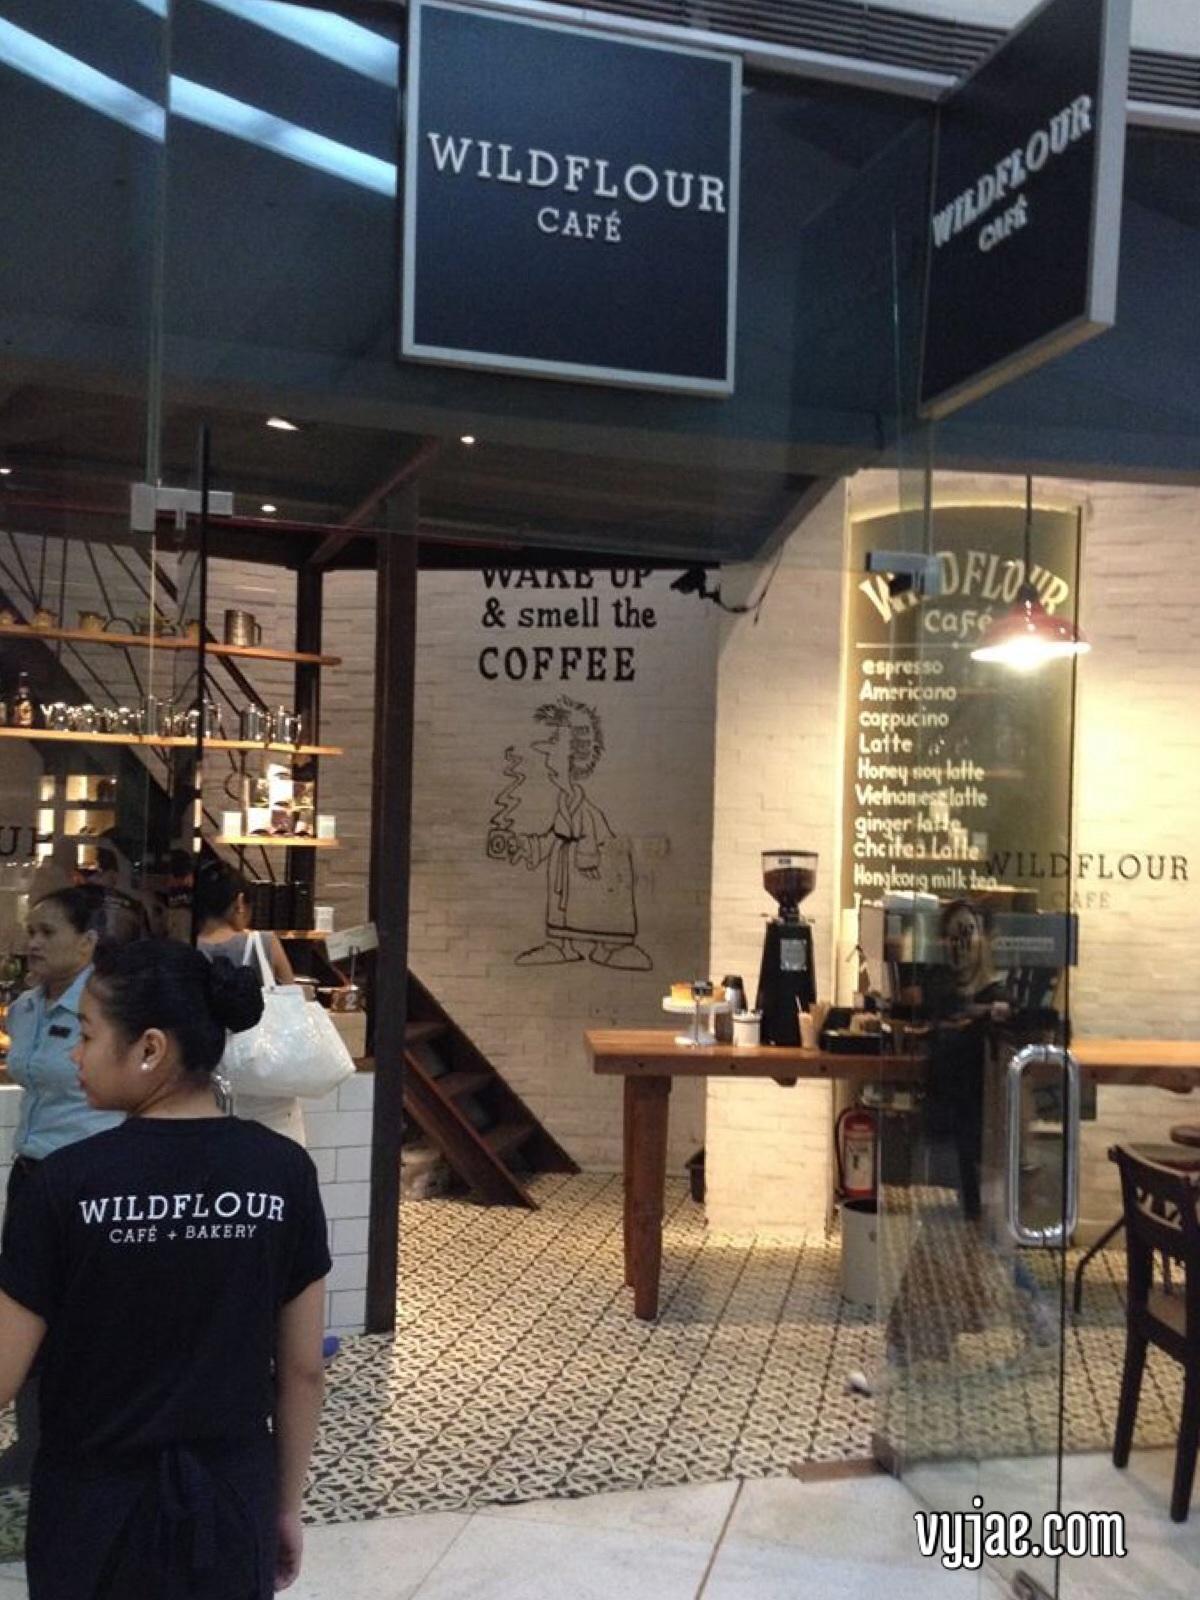 Wildflour Cafe